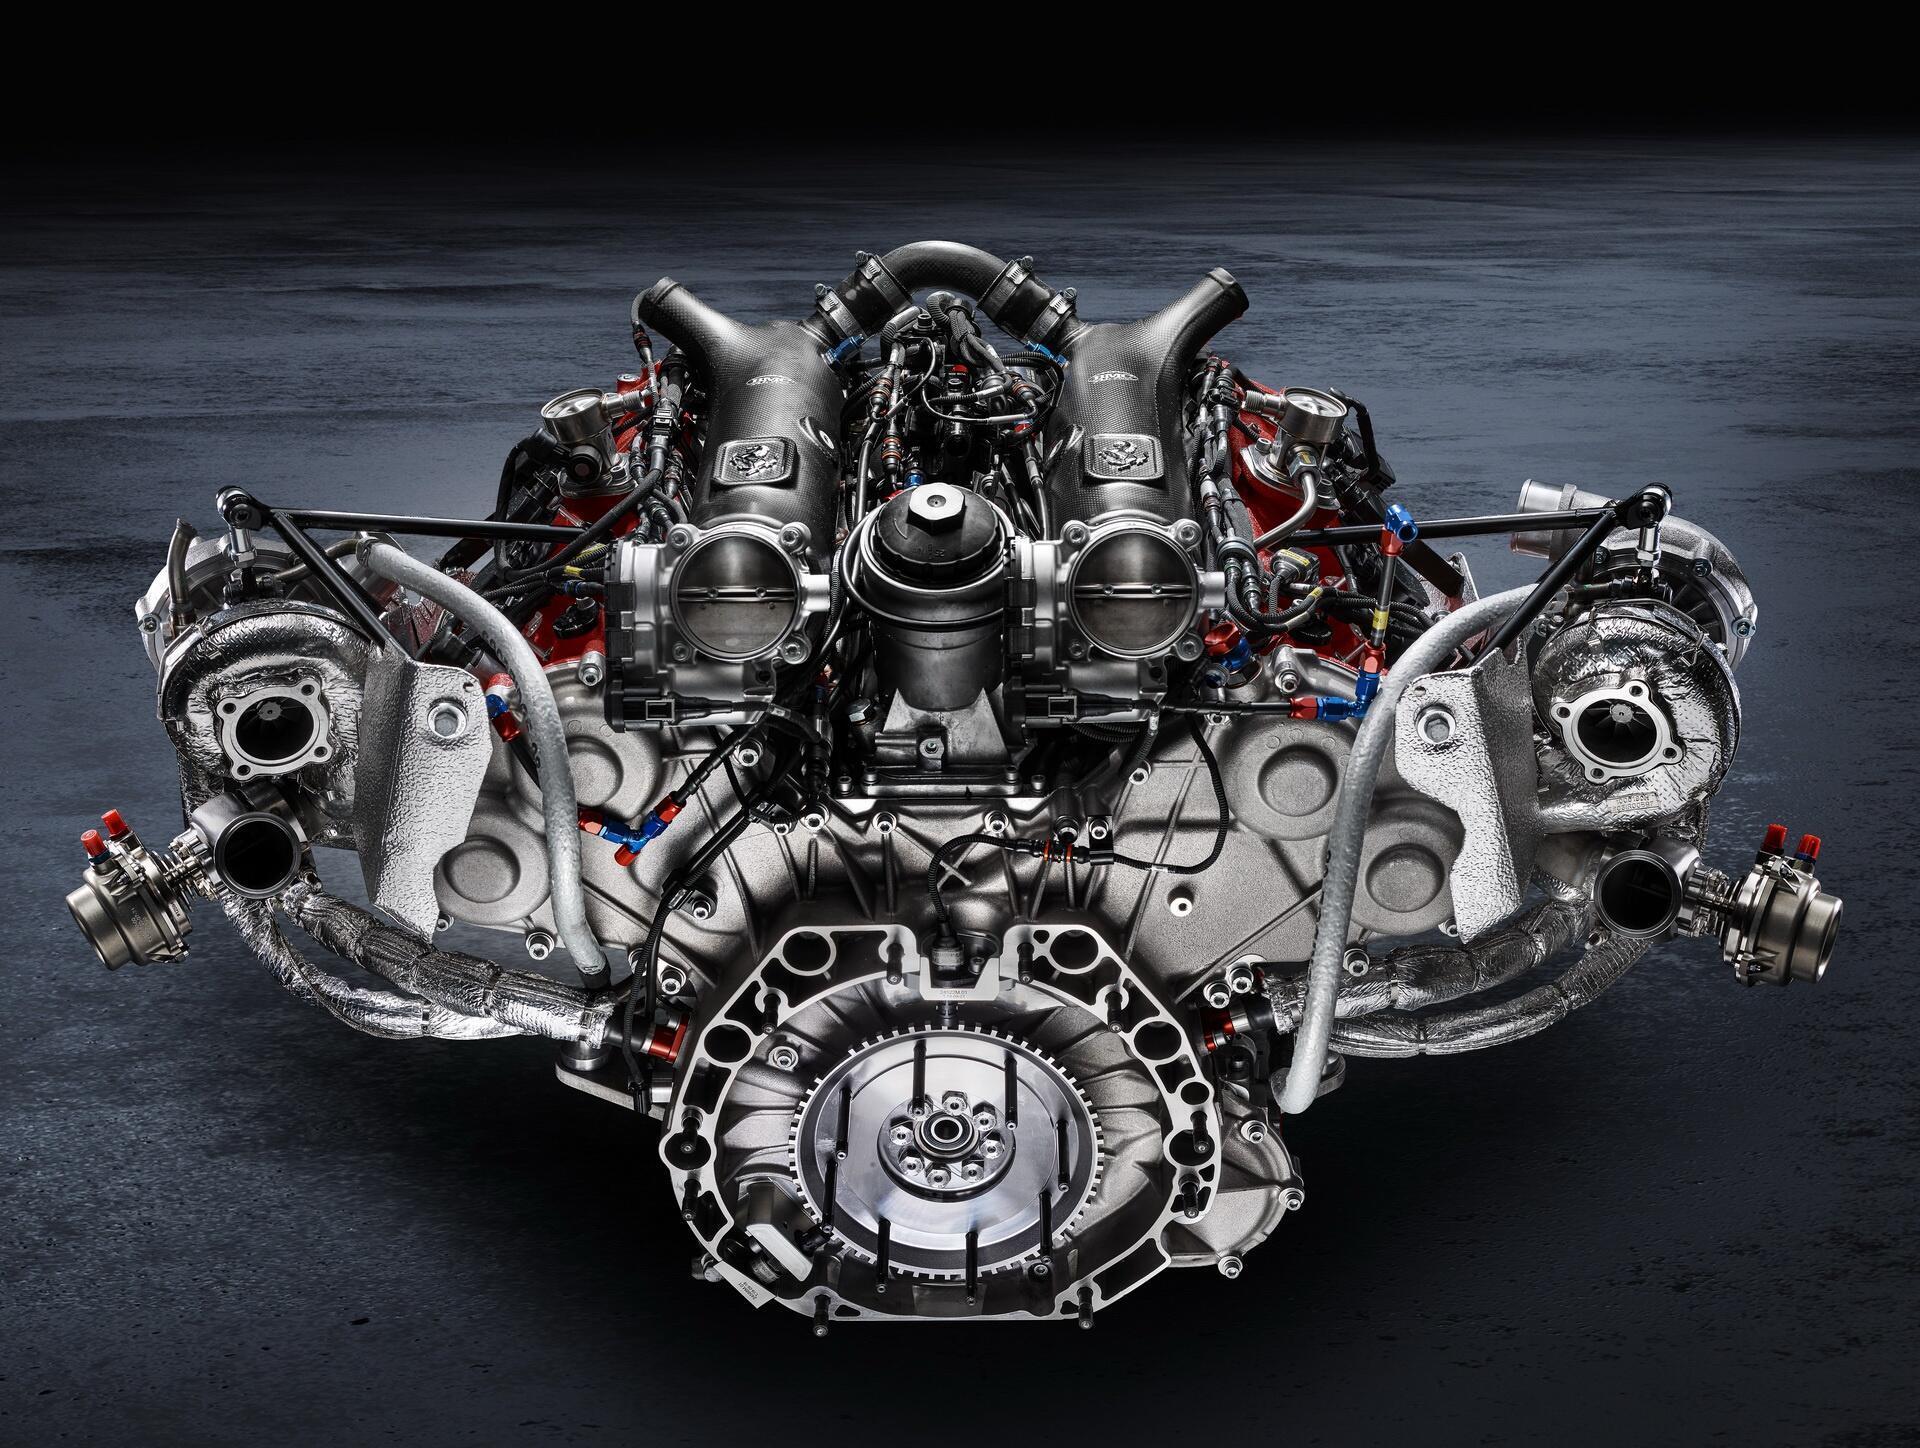 ferrari-488-gt-modificata-duoc-ra-mat-manh-700-ma-luc